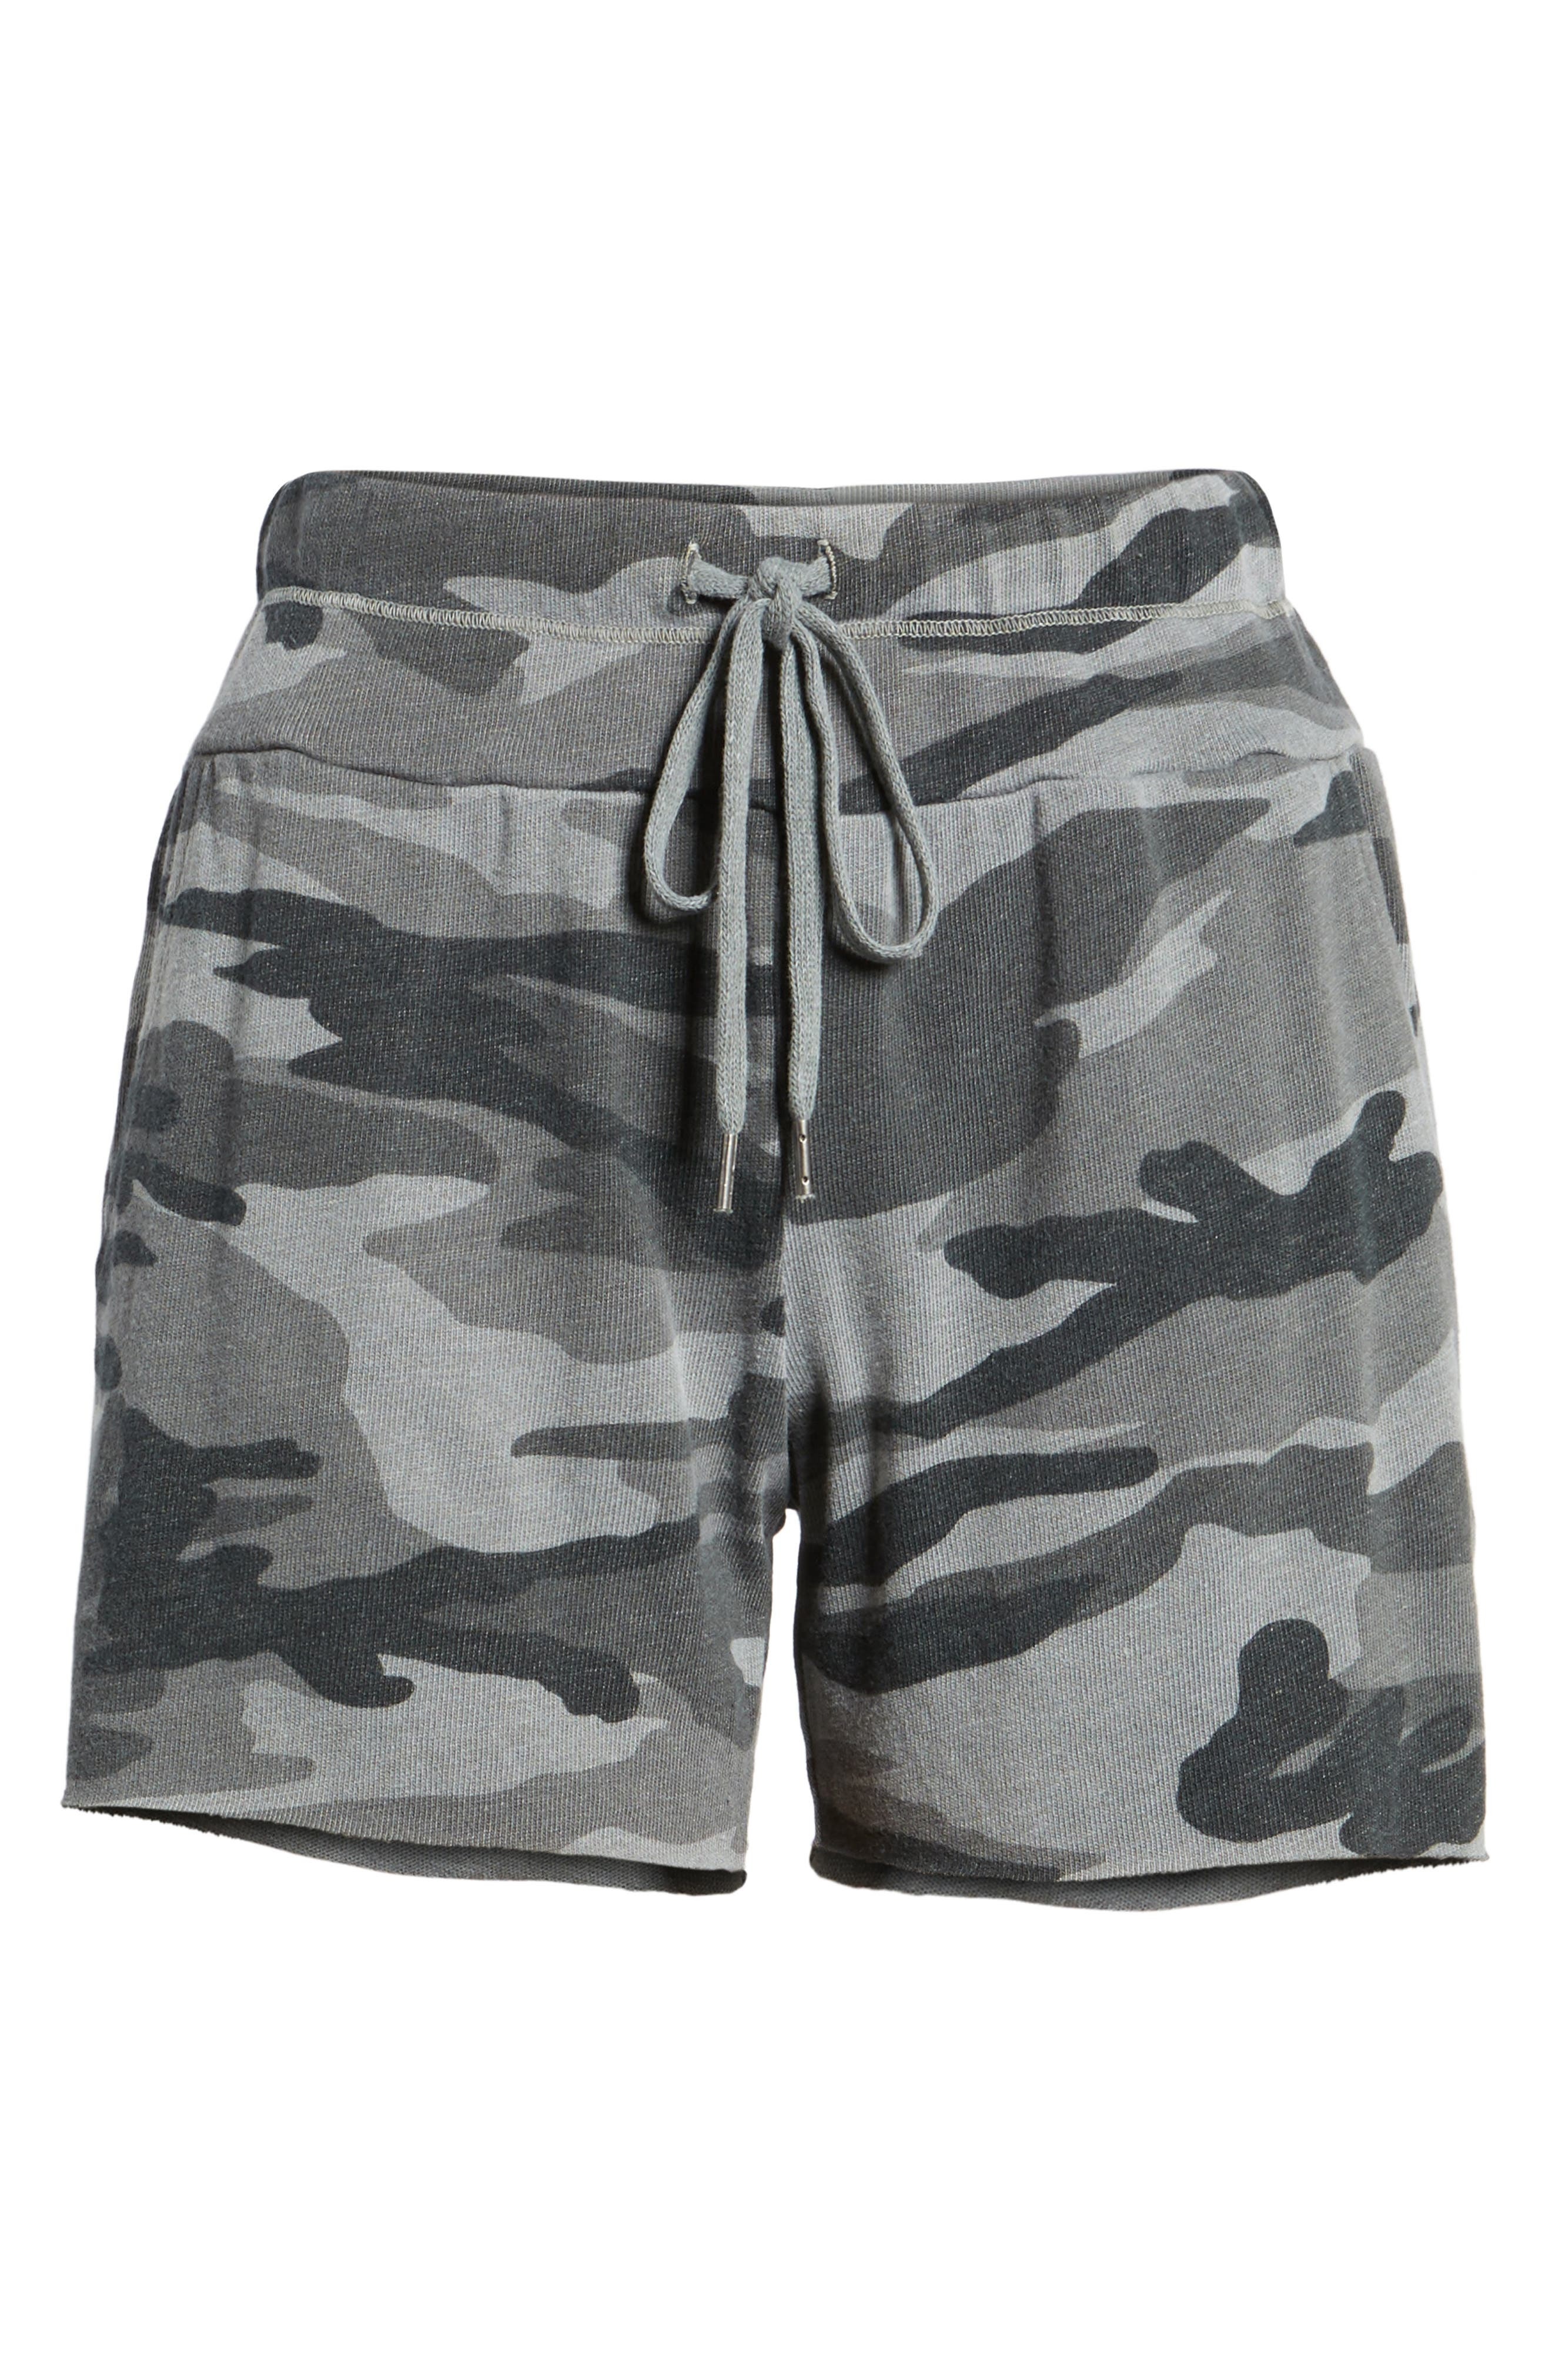 Camo Shorts,                             Alternate thumbnail 6, color,                             301